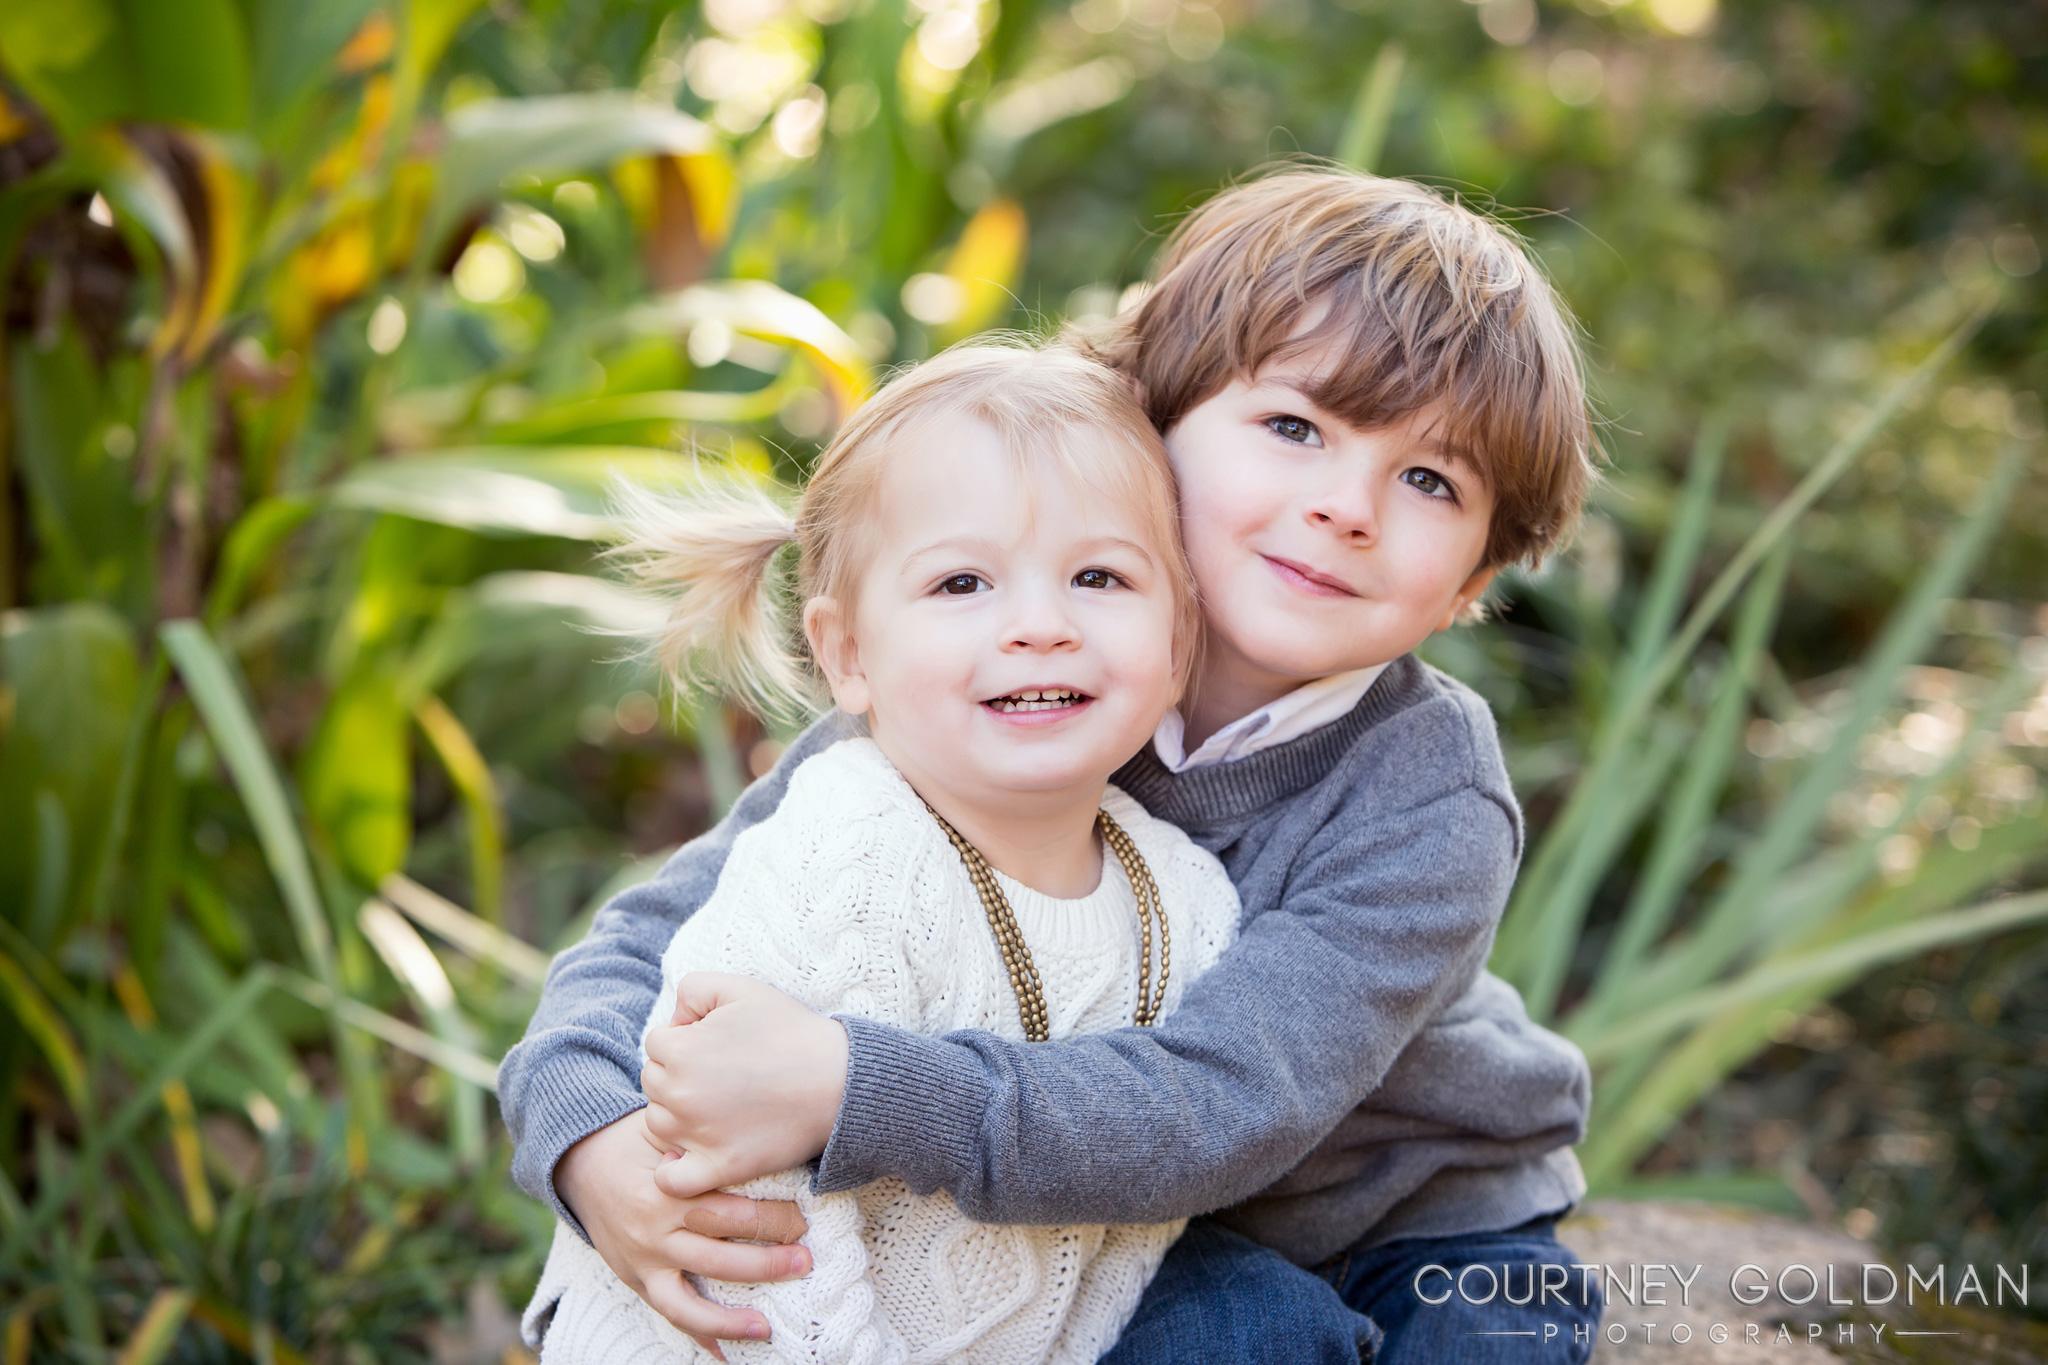 002-Atlanta-Family-kids-Portrait-Photography-by-Coutney-Goldman.jpg